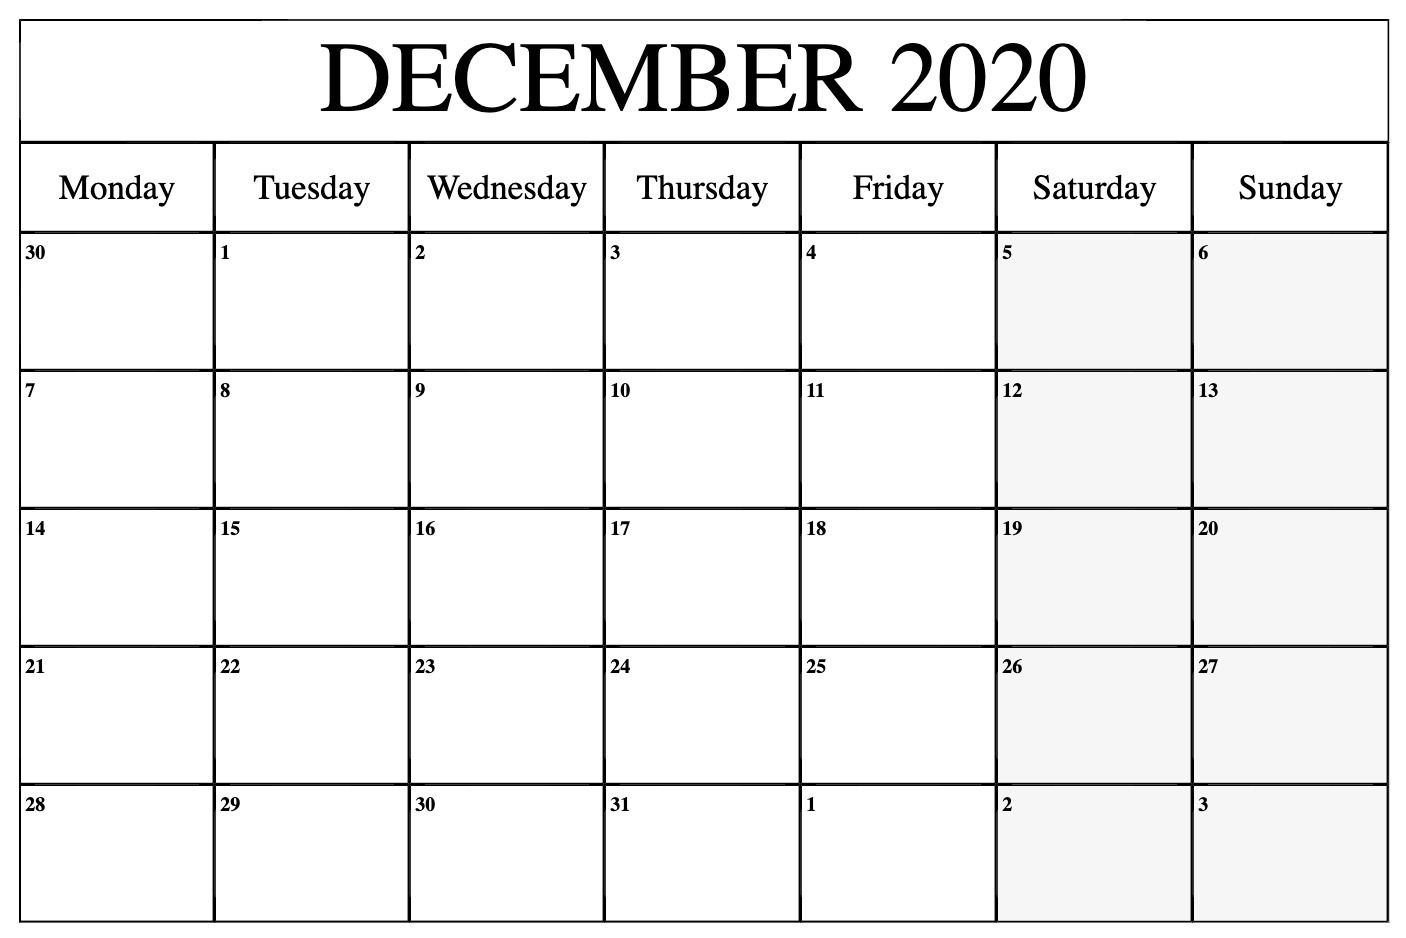 December 2020 Calendar Template Word, Pdf, Excel Format